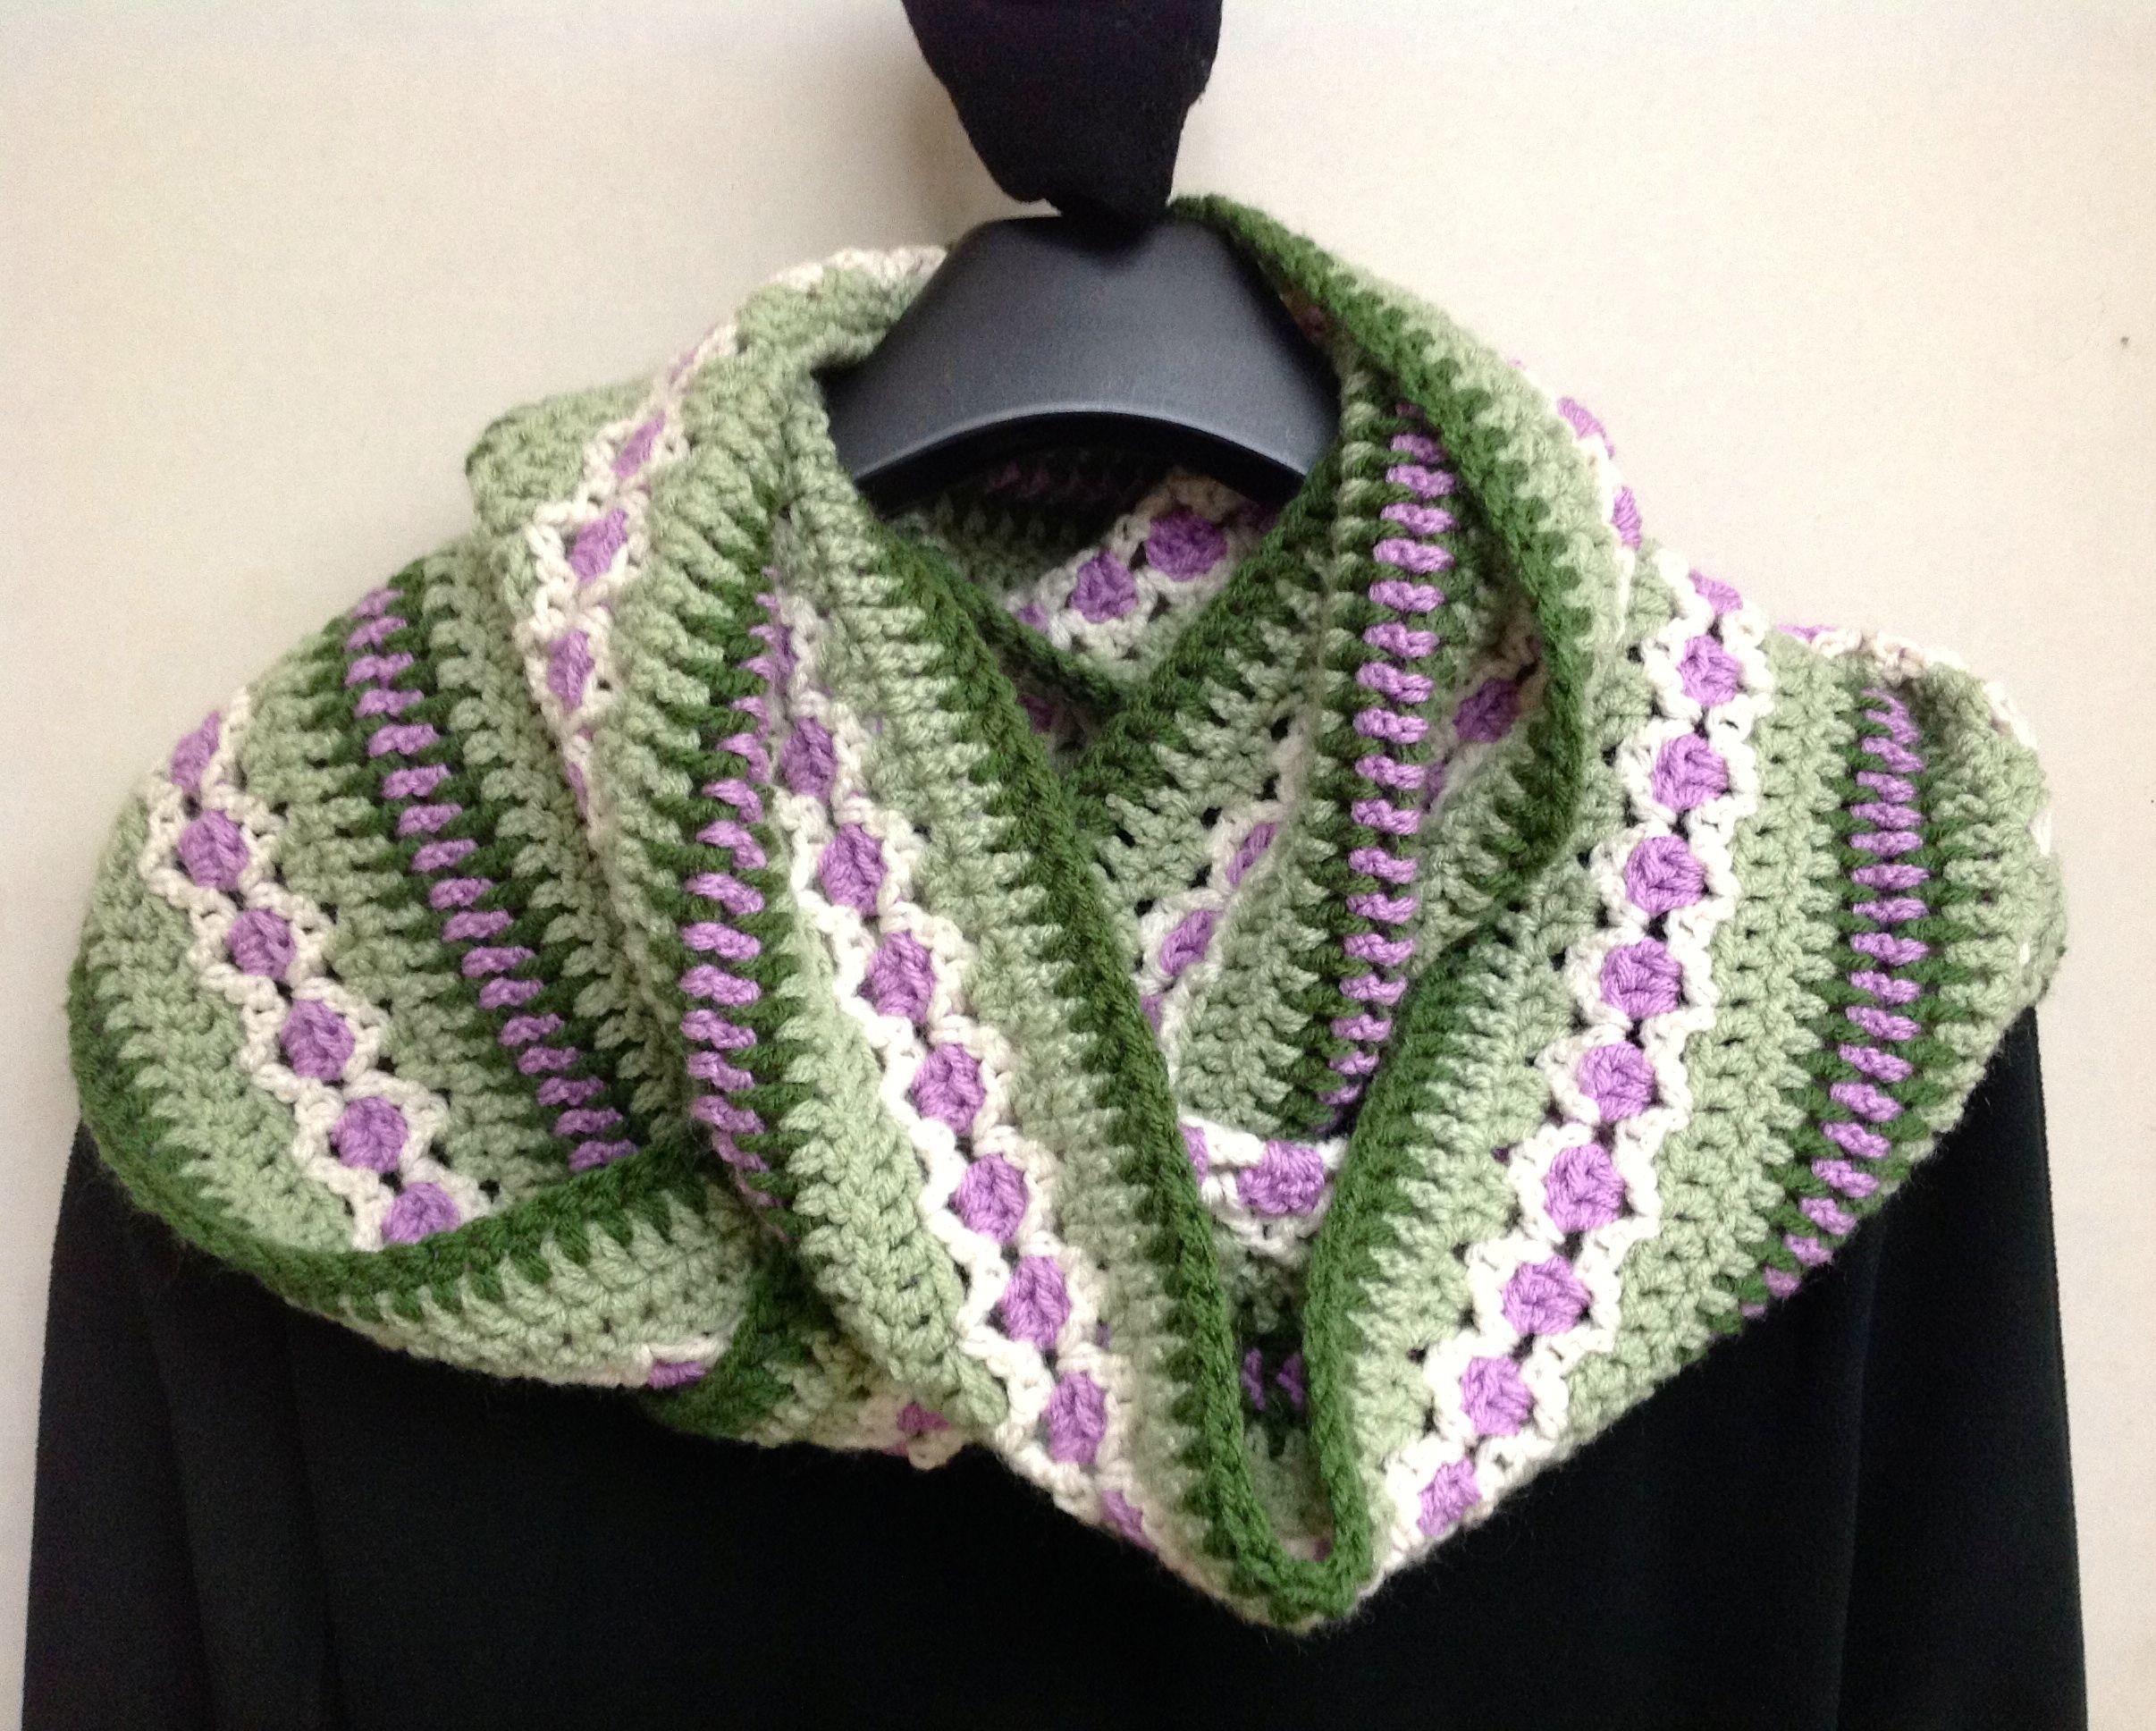 Free crochet pattern at Ravelry http://www.ravelry.com/patterns ...